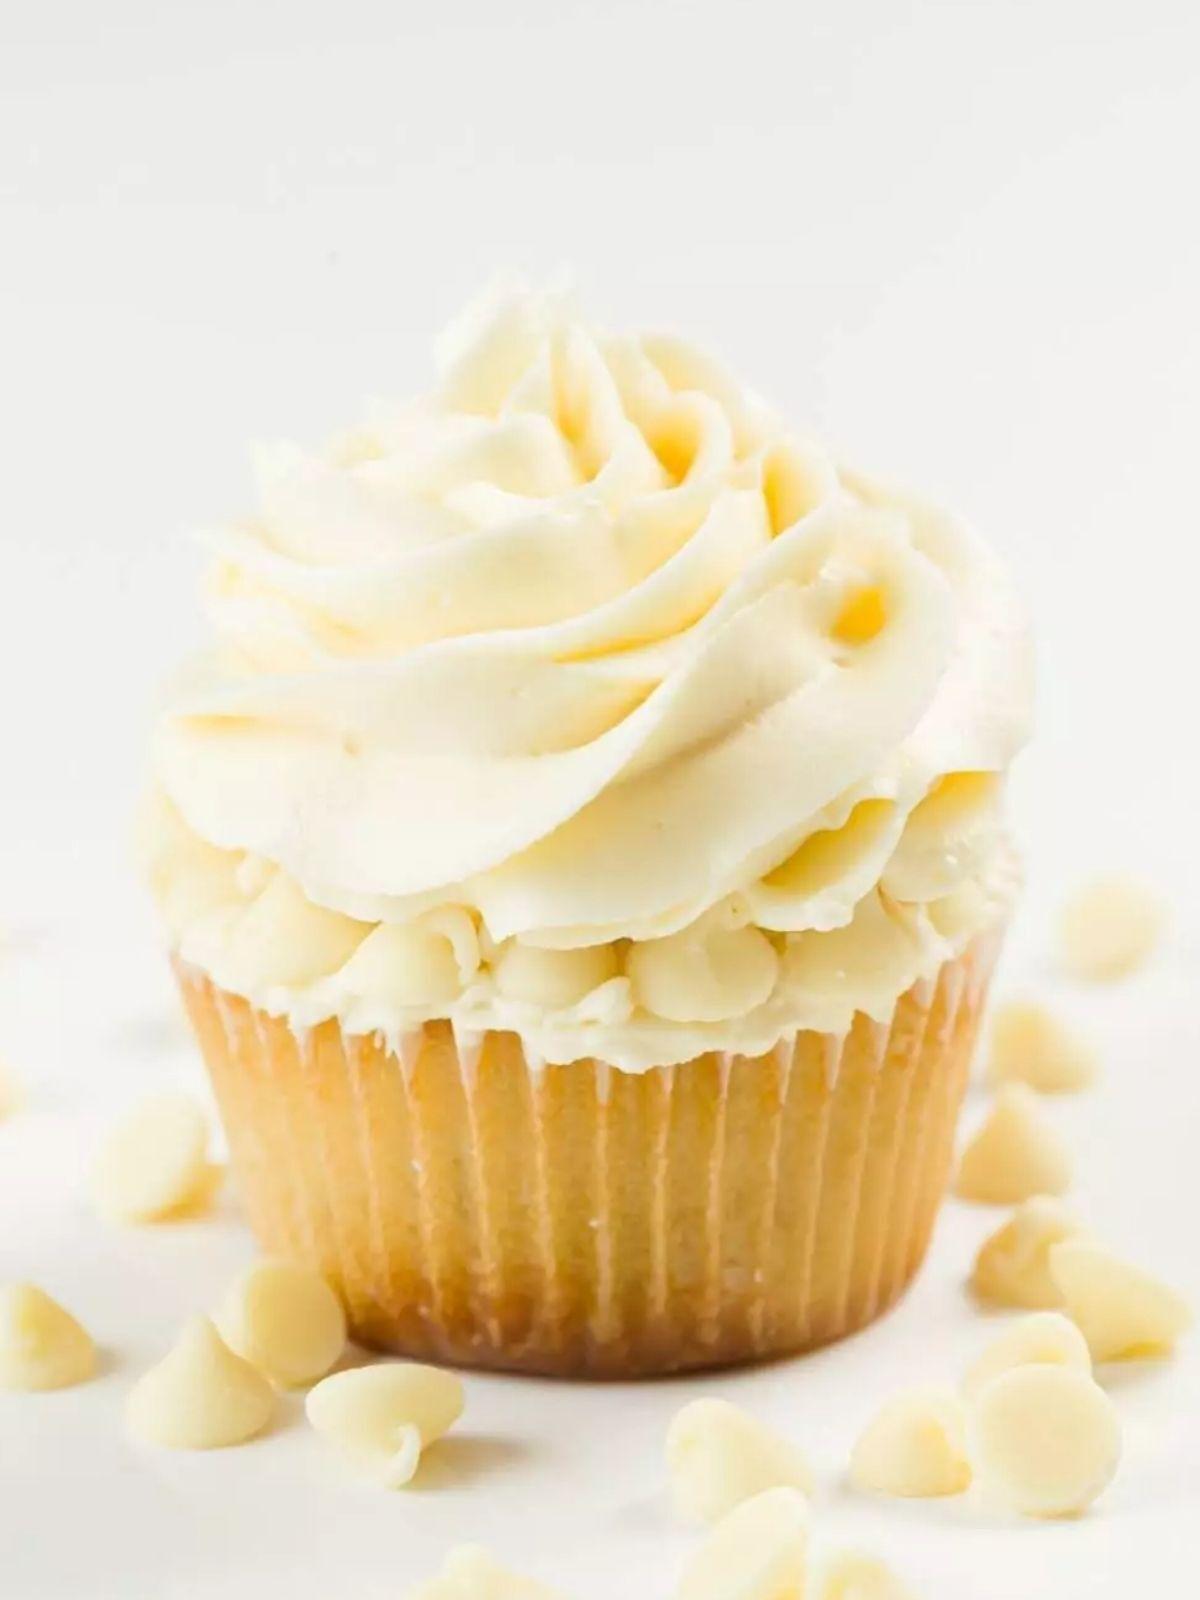 White chocolate cupcake swirled with frosting and with white chocolate chips around it.